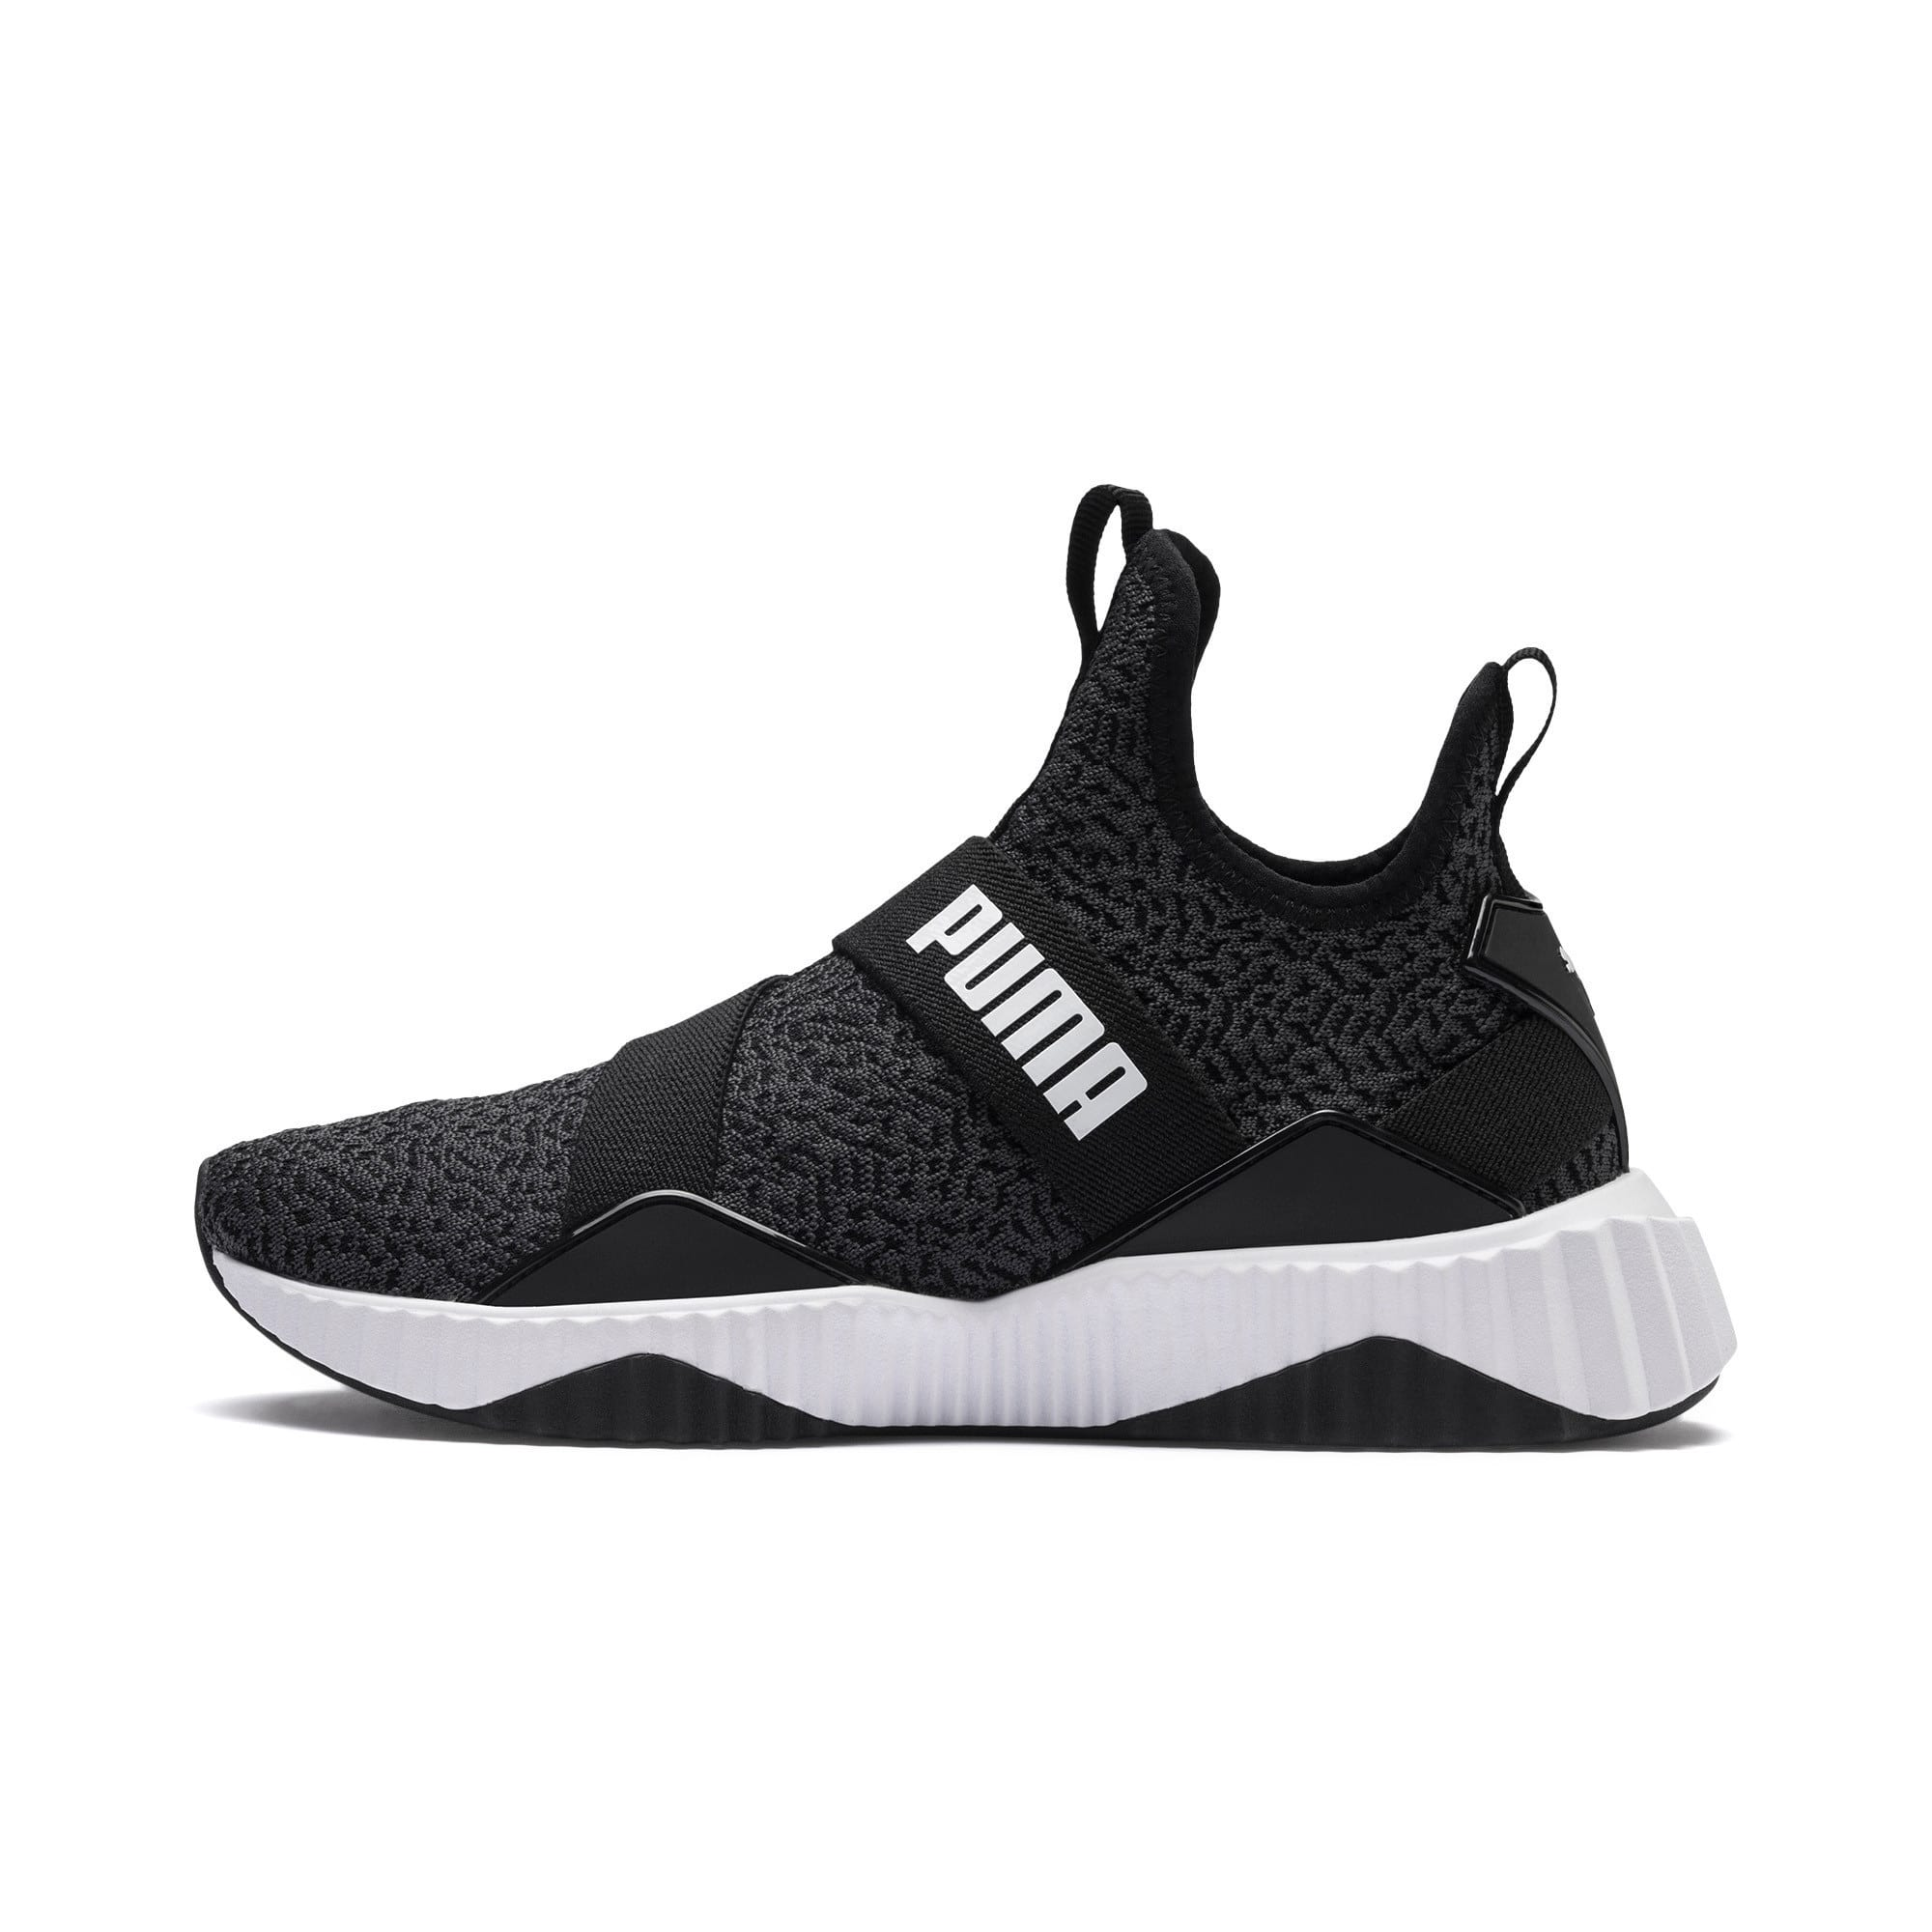 Thumbnail 1 of Defy Mid Animal Women's Training Shoes, Puma Black-Puma White, medium-IND